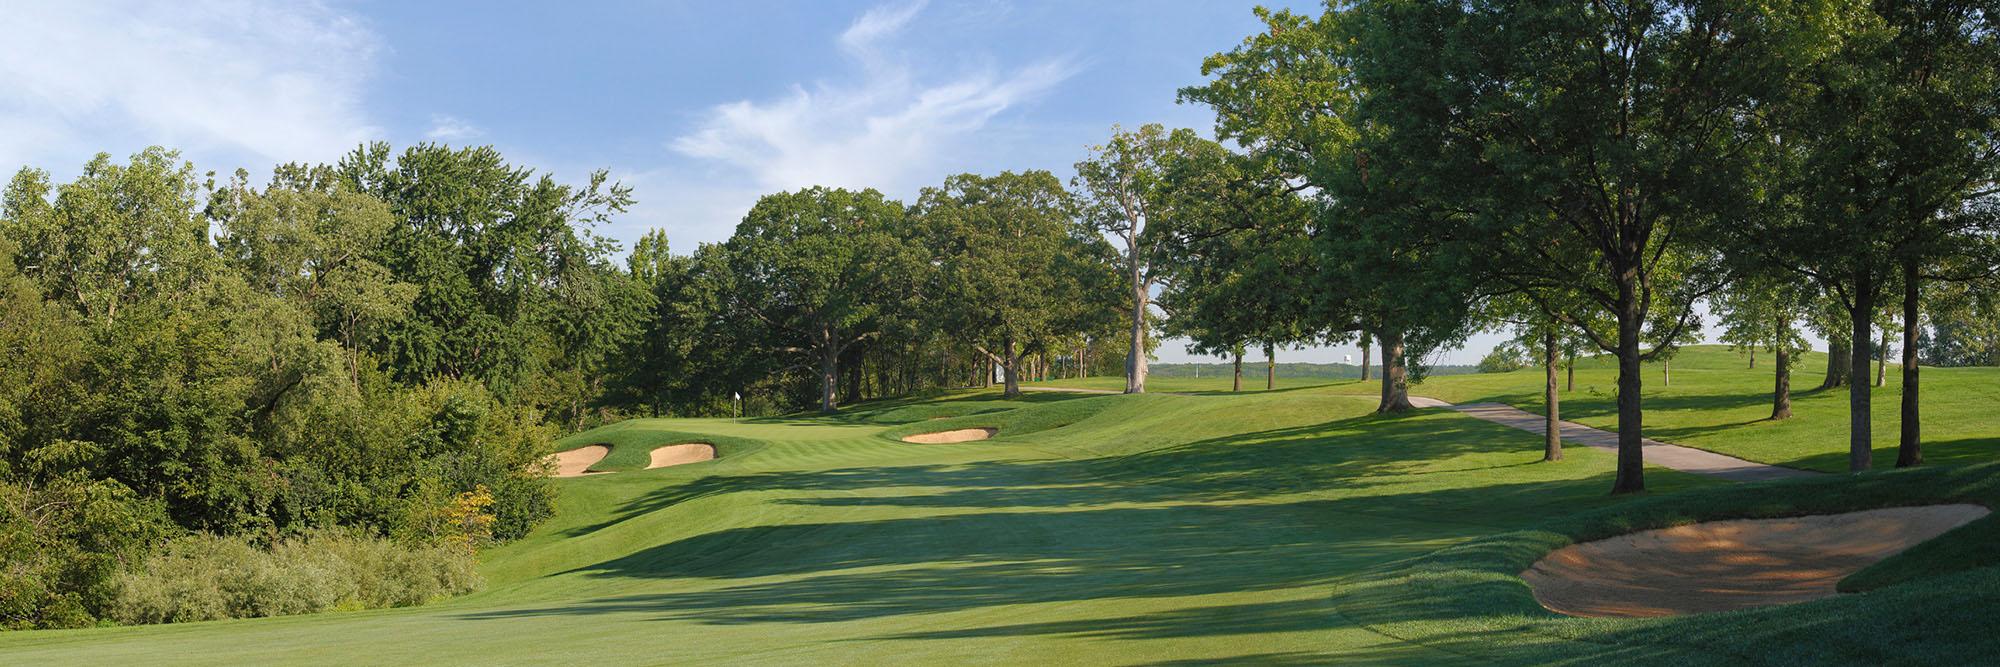 Golf Course Image - Cog Hill 4 No. 16